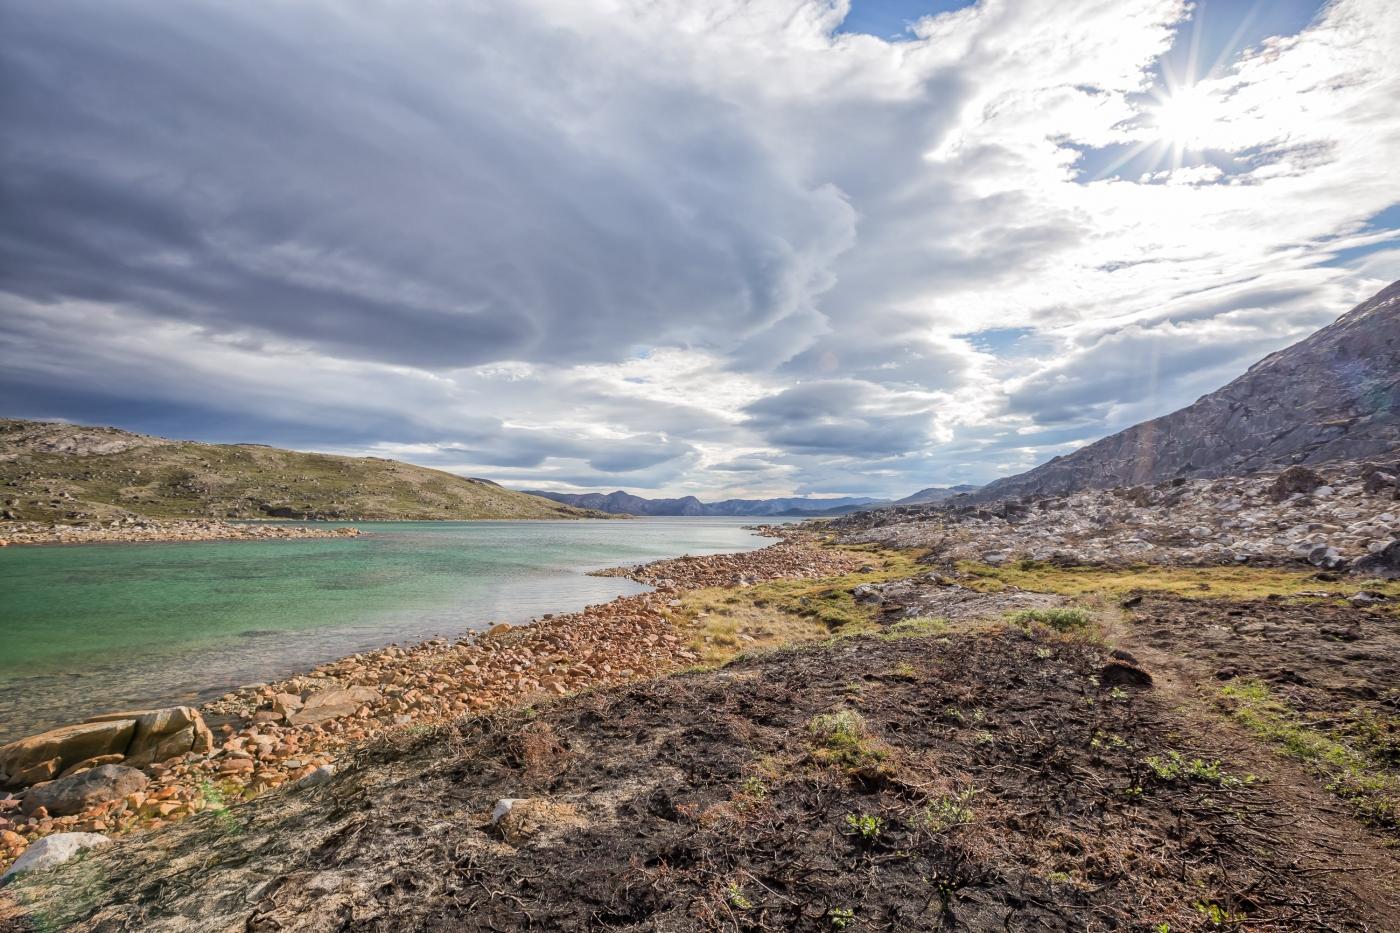 Rough shoreline along Amitsorsuaq Lake on the Arctic Circle Trail. Photo by Lina Stock.